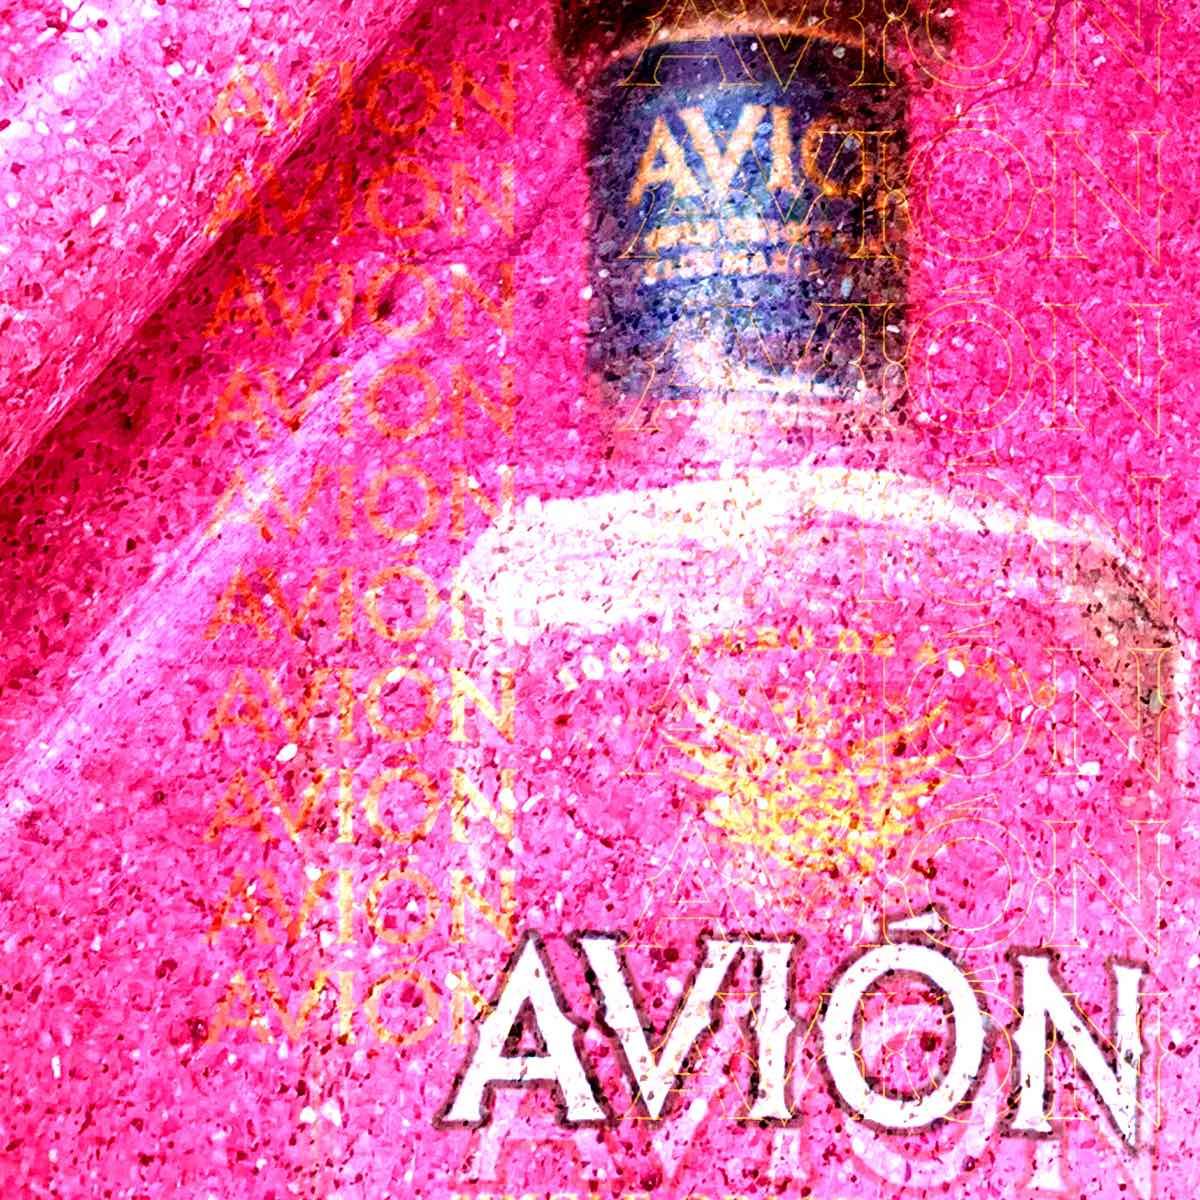 FY19_AVION_SILVER_ALWAYSON_NATIONAL_PRODUCT_INSTAGRAM-FACEBOOK_STILL_1x1_CDMX-HC-61319.jpeg